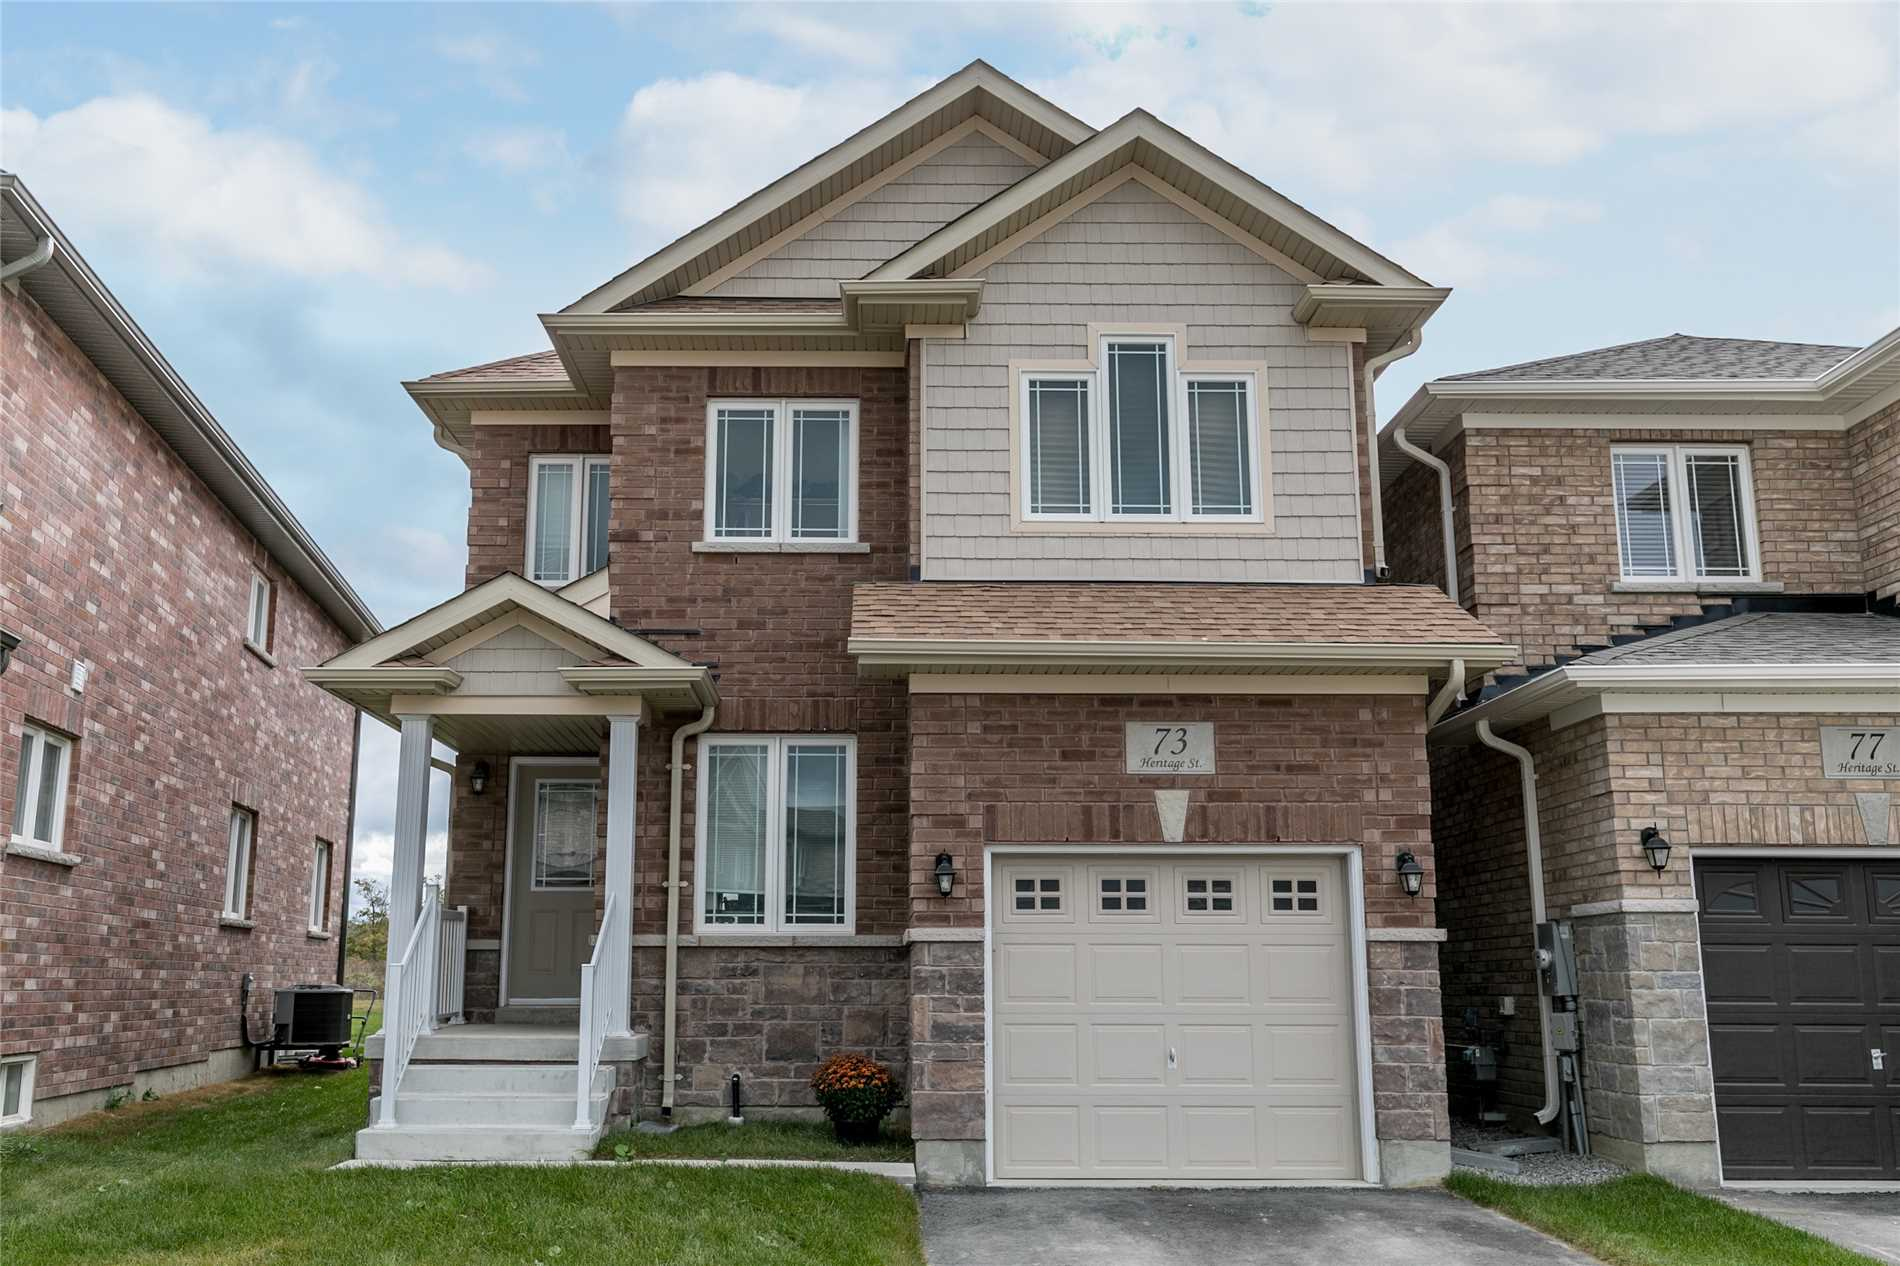 House for sale at 73 Heritage Street Bradford West Gwillimbury Ontario - MLS: N4320861